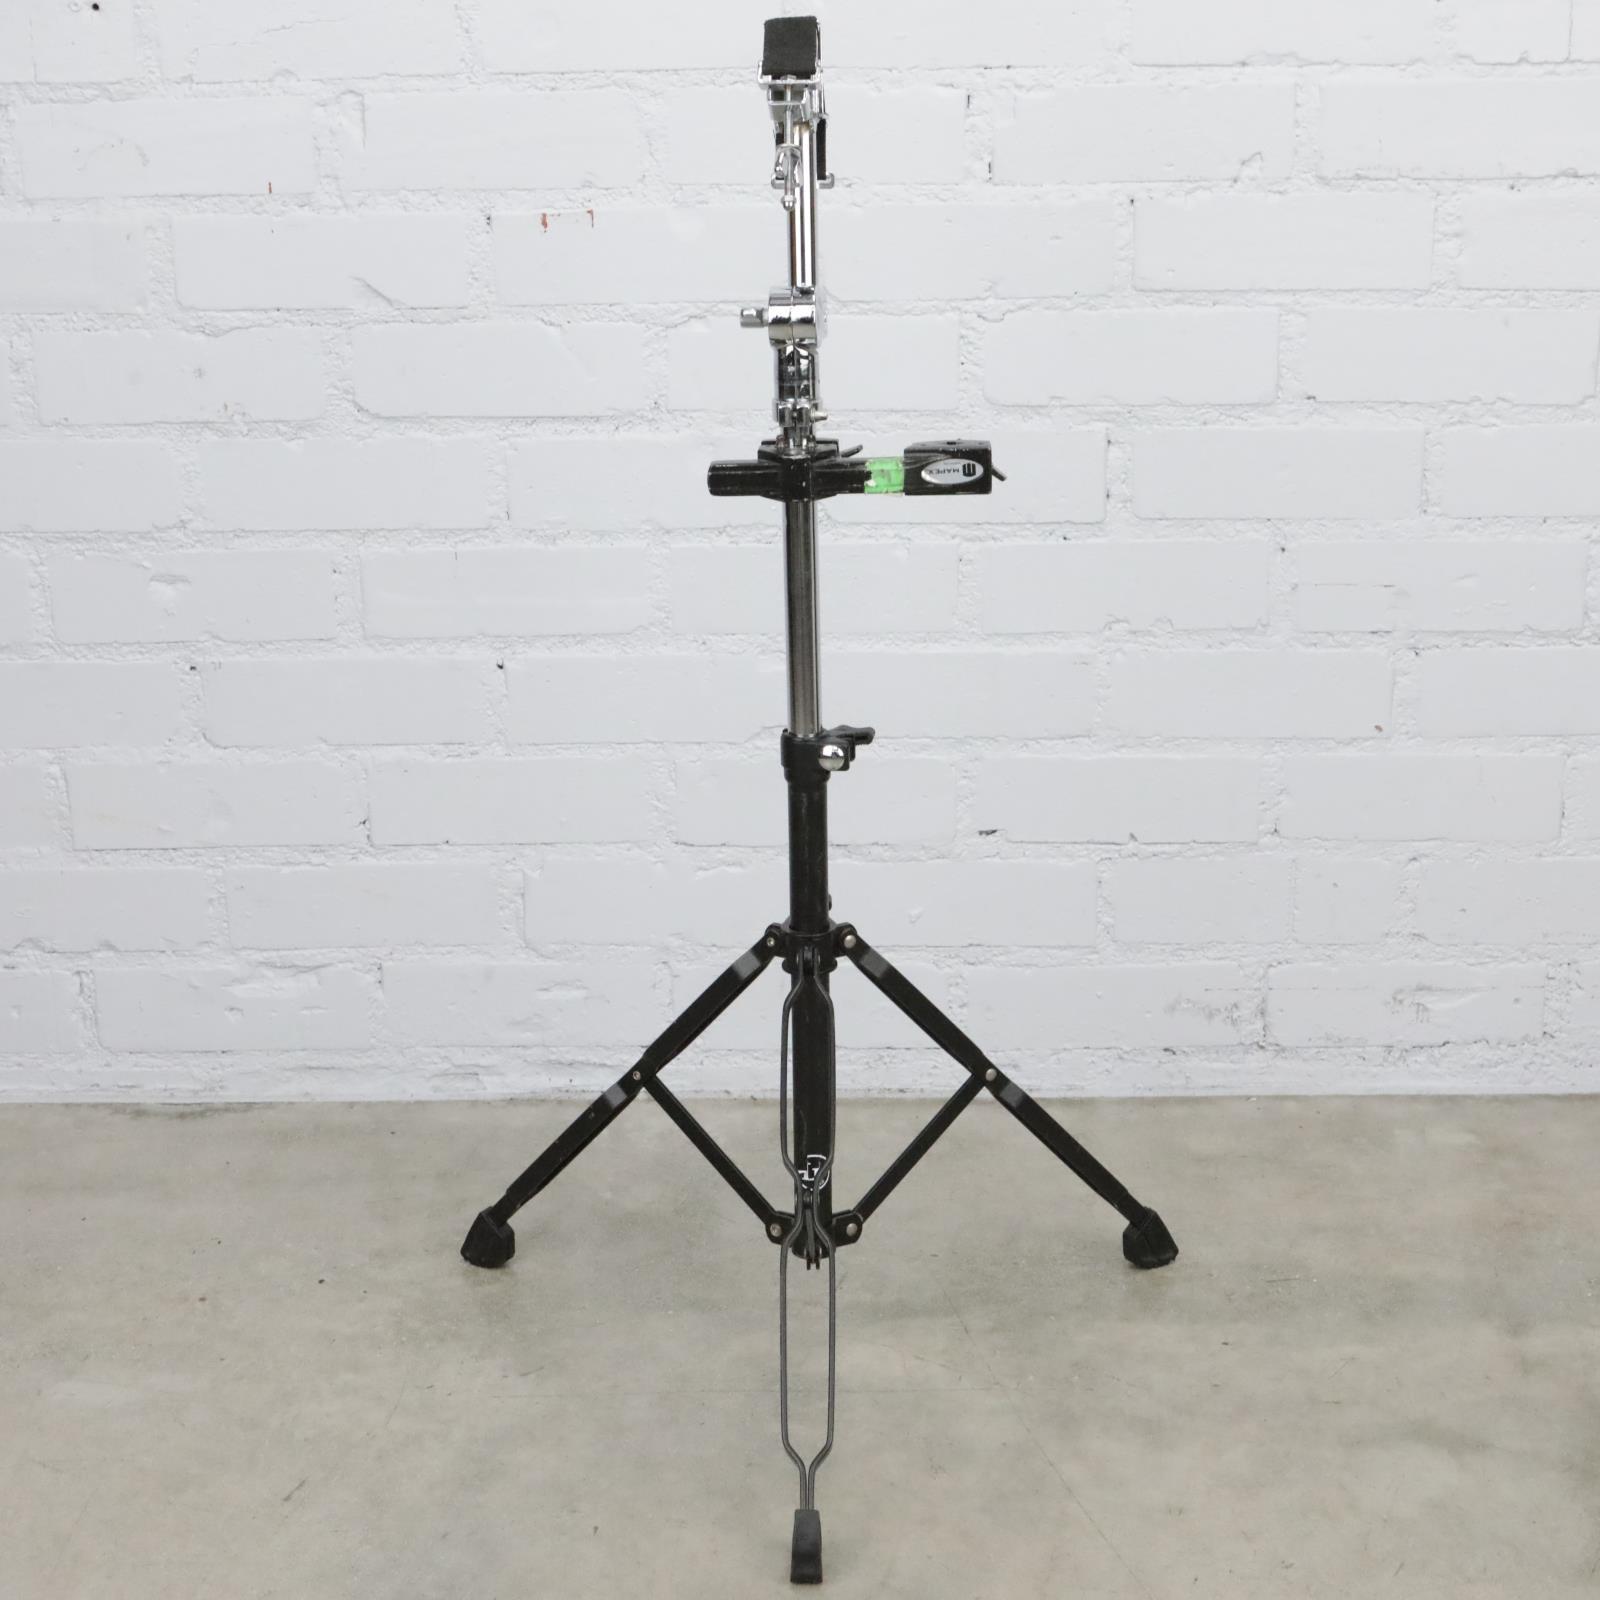 Latin Percussion LPA653 Base w/ LPM245 Bongo Strap-Lock Mount #41175